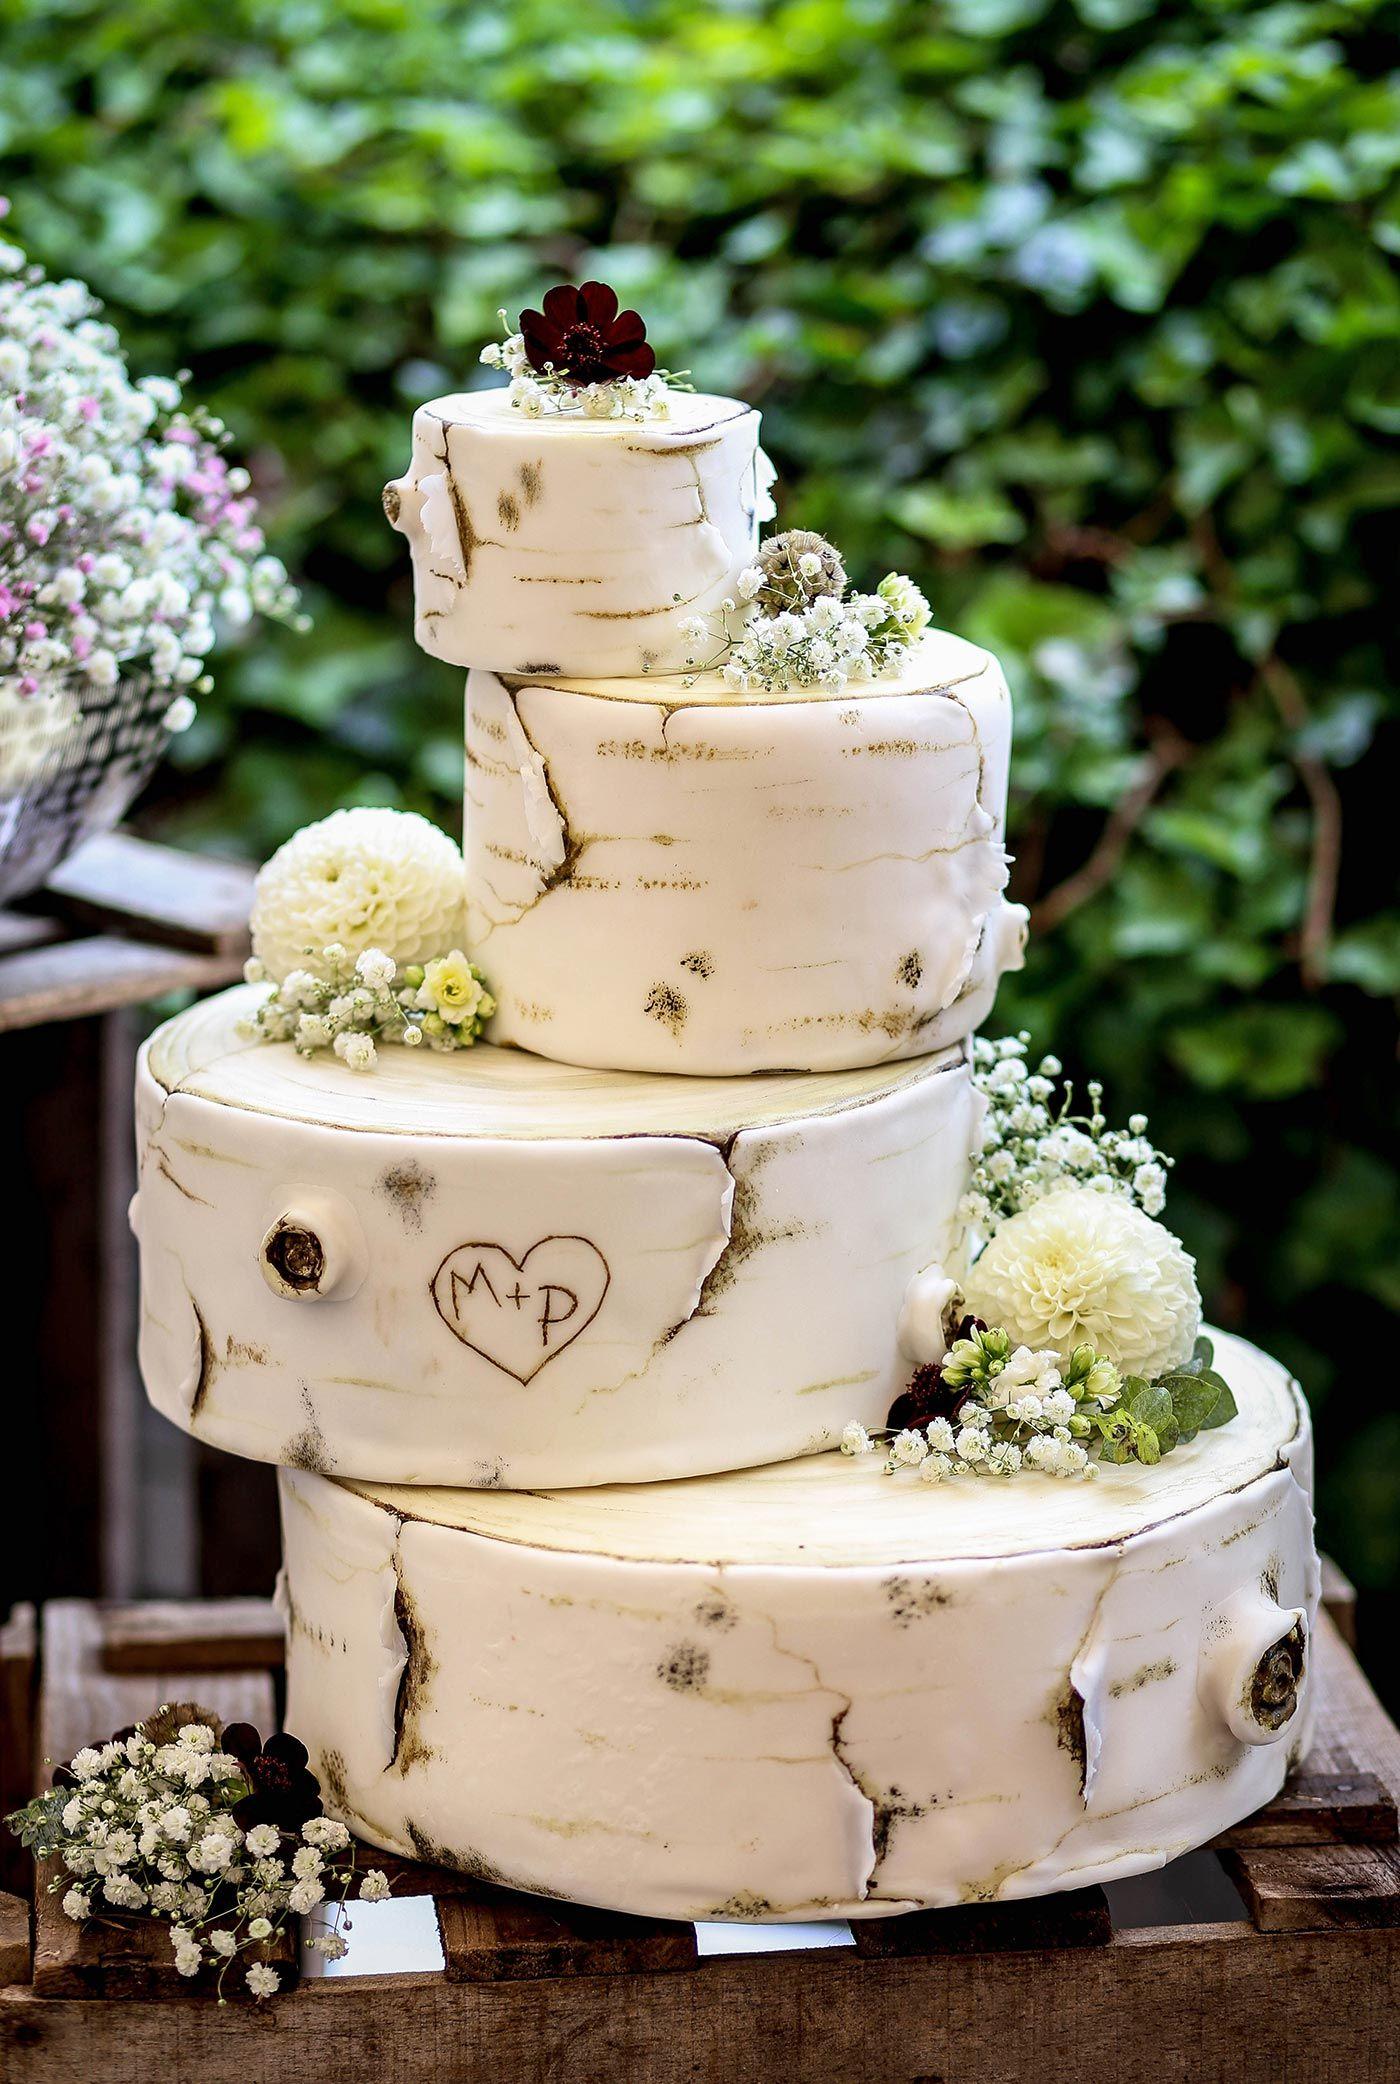 4 Stockige Hochzeitstorte I Ideen Inspiration Wedding Cakes